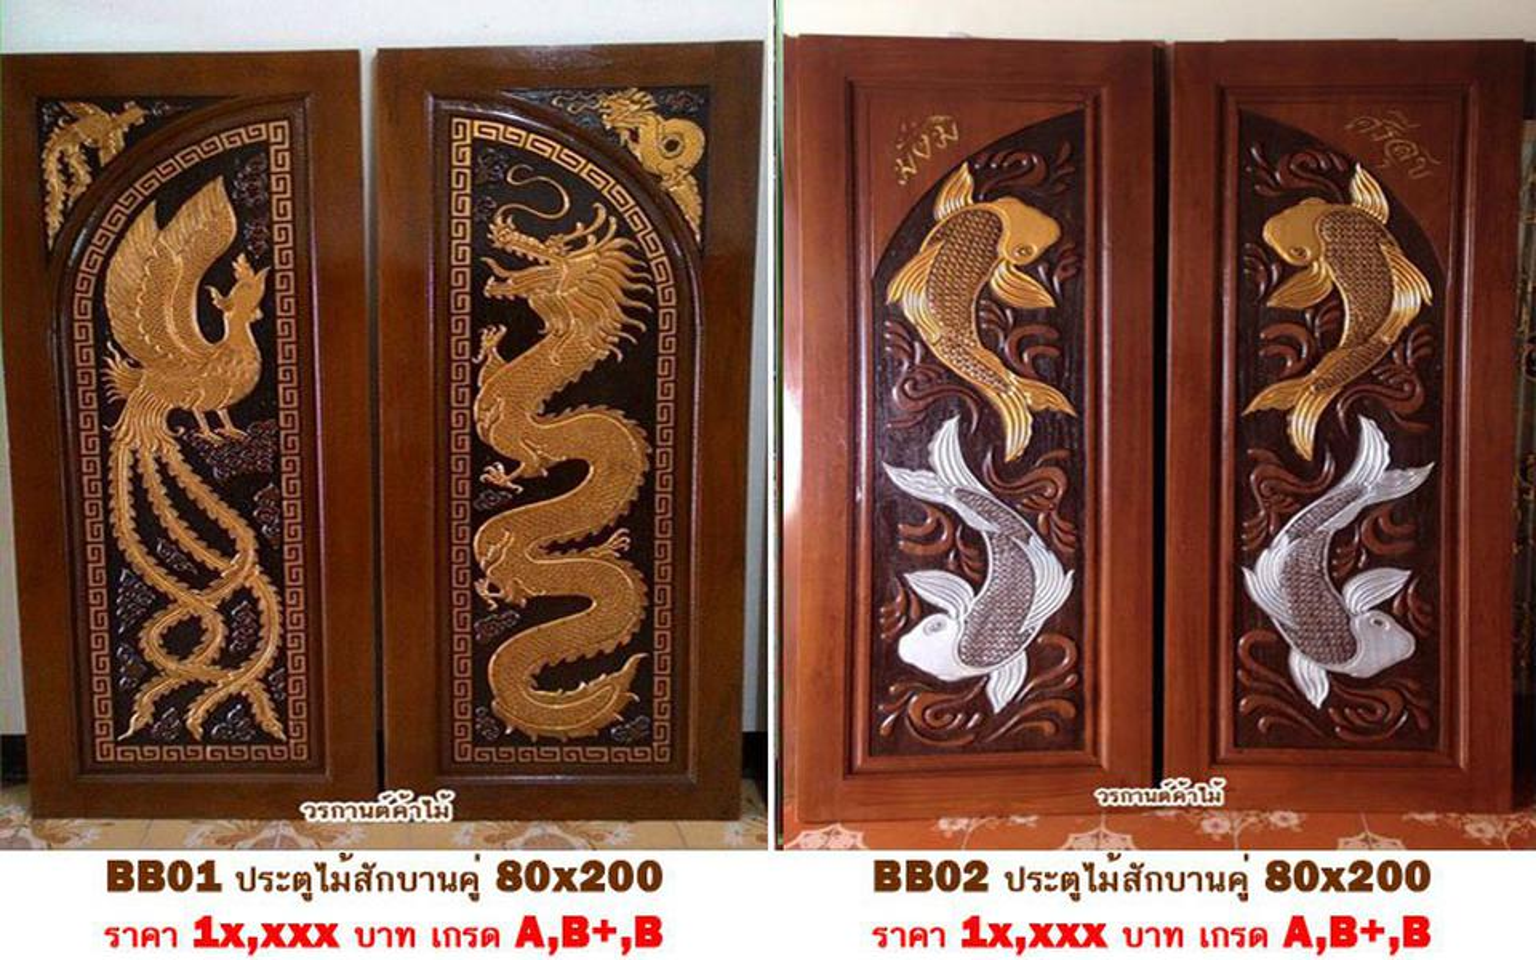 door-woodhome จำหน่ายประตูไม้สัก,ประตูไม้สักกระจกนิรภัย,ประตูไม้สักบานคู่ รูปที่ 6